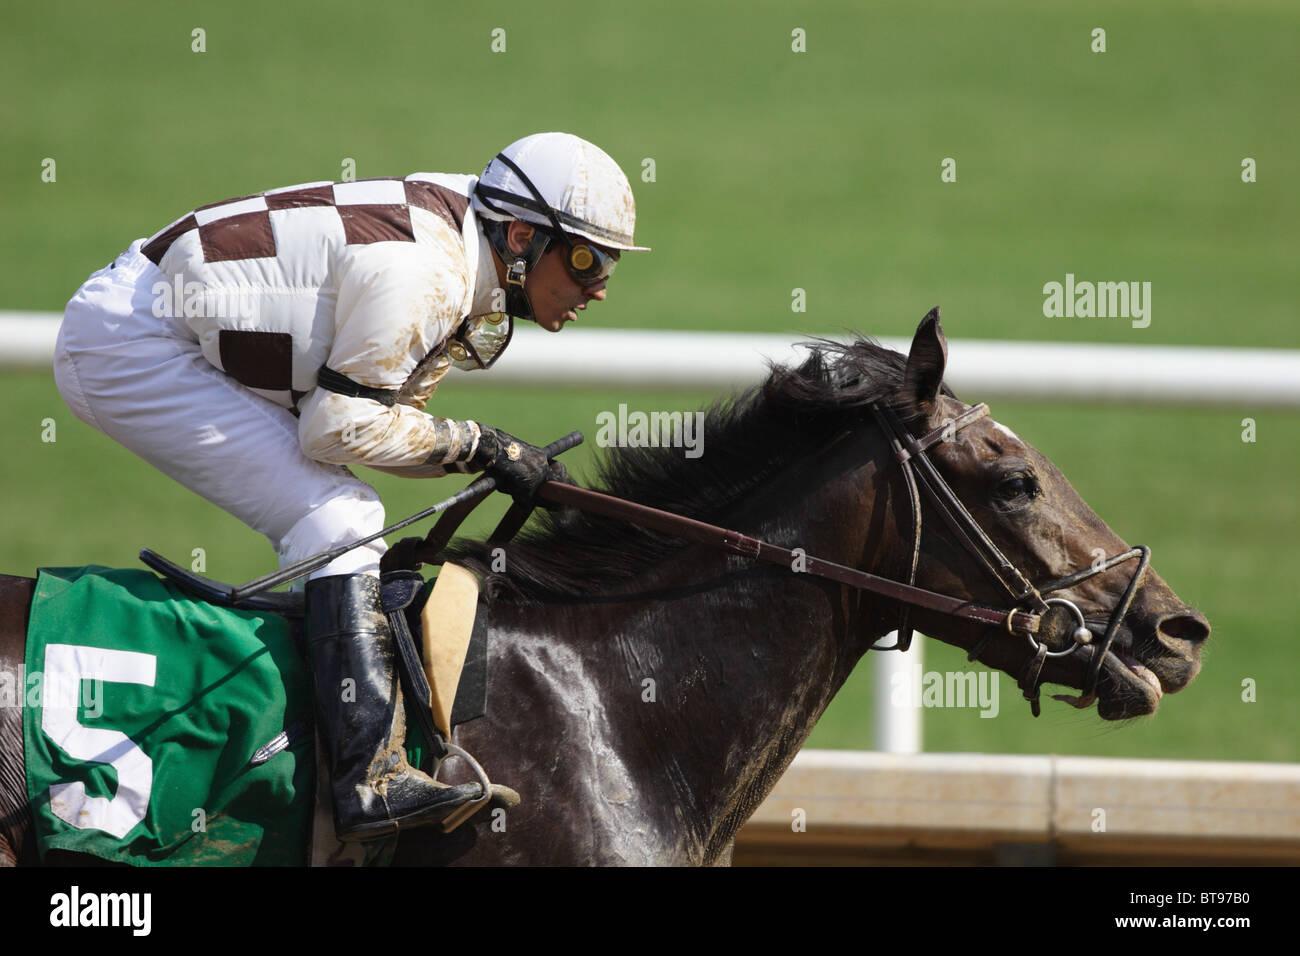 Jockey vincendo gara a Colonial Downs racetrack in New Kent County, Virginia. Luglio 2010 Immagini Stock